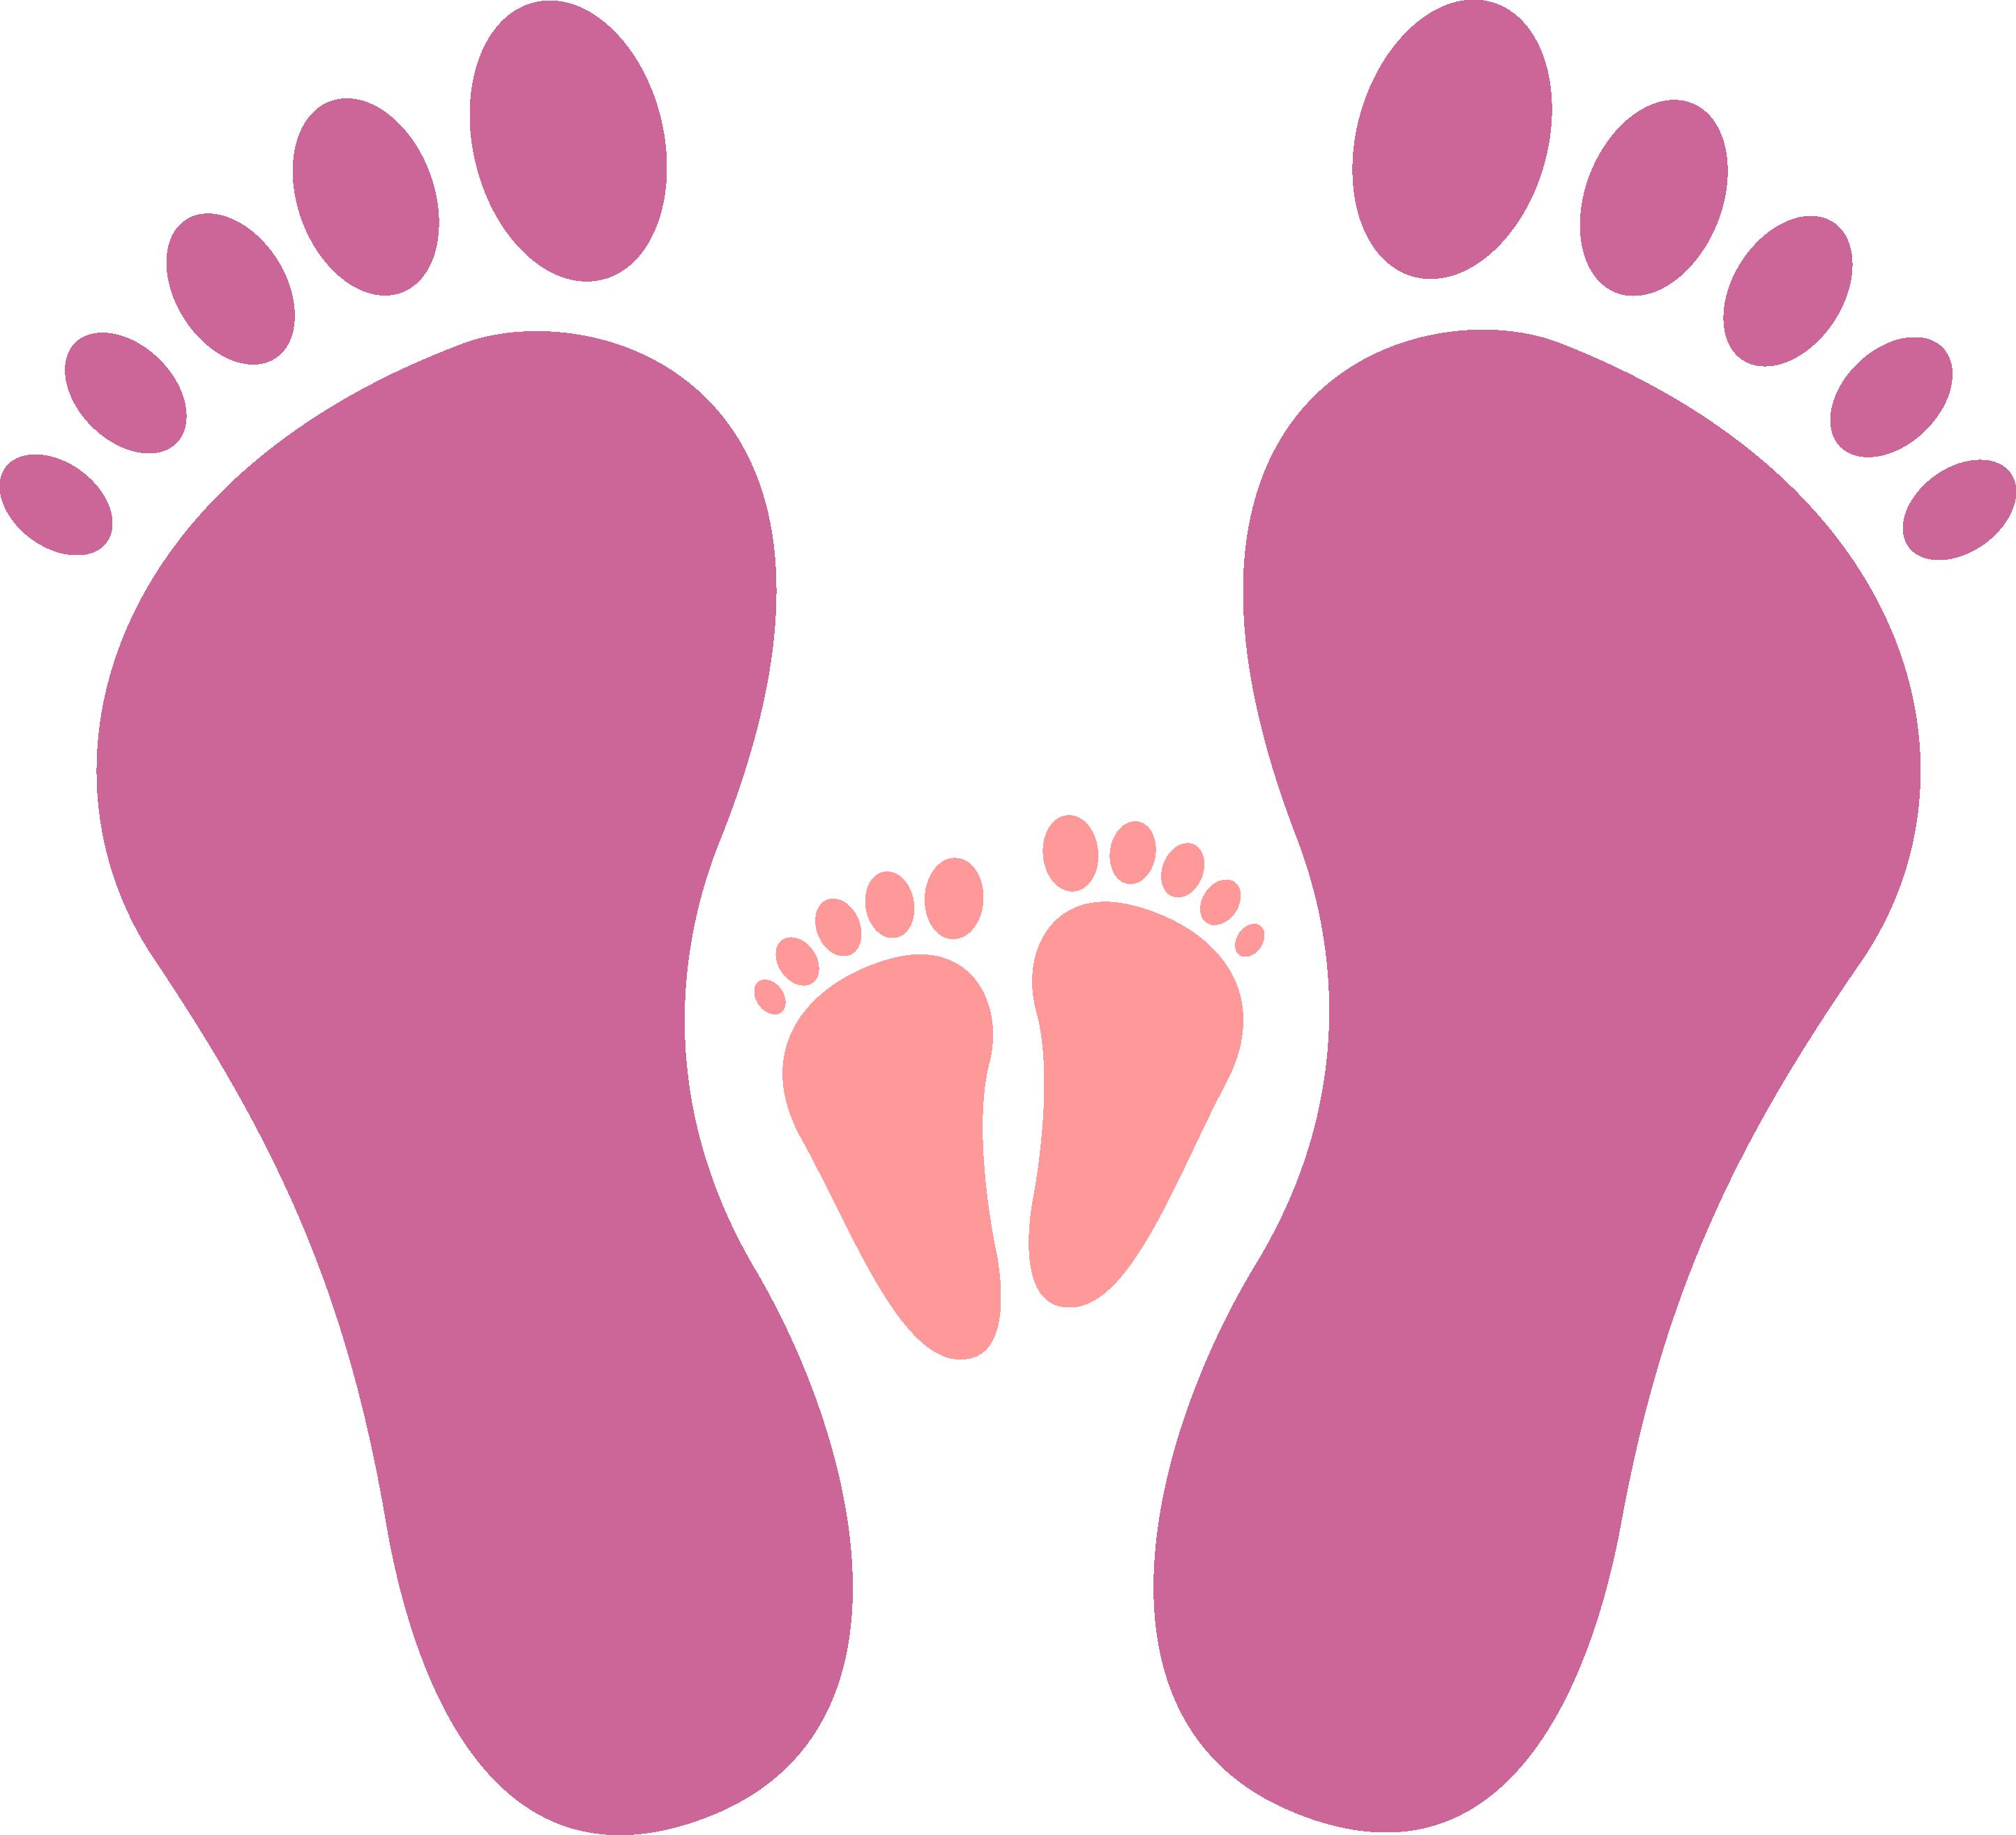 Download icon big and. Footprints clipart human footprint